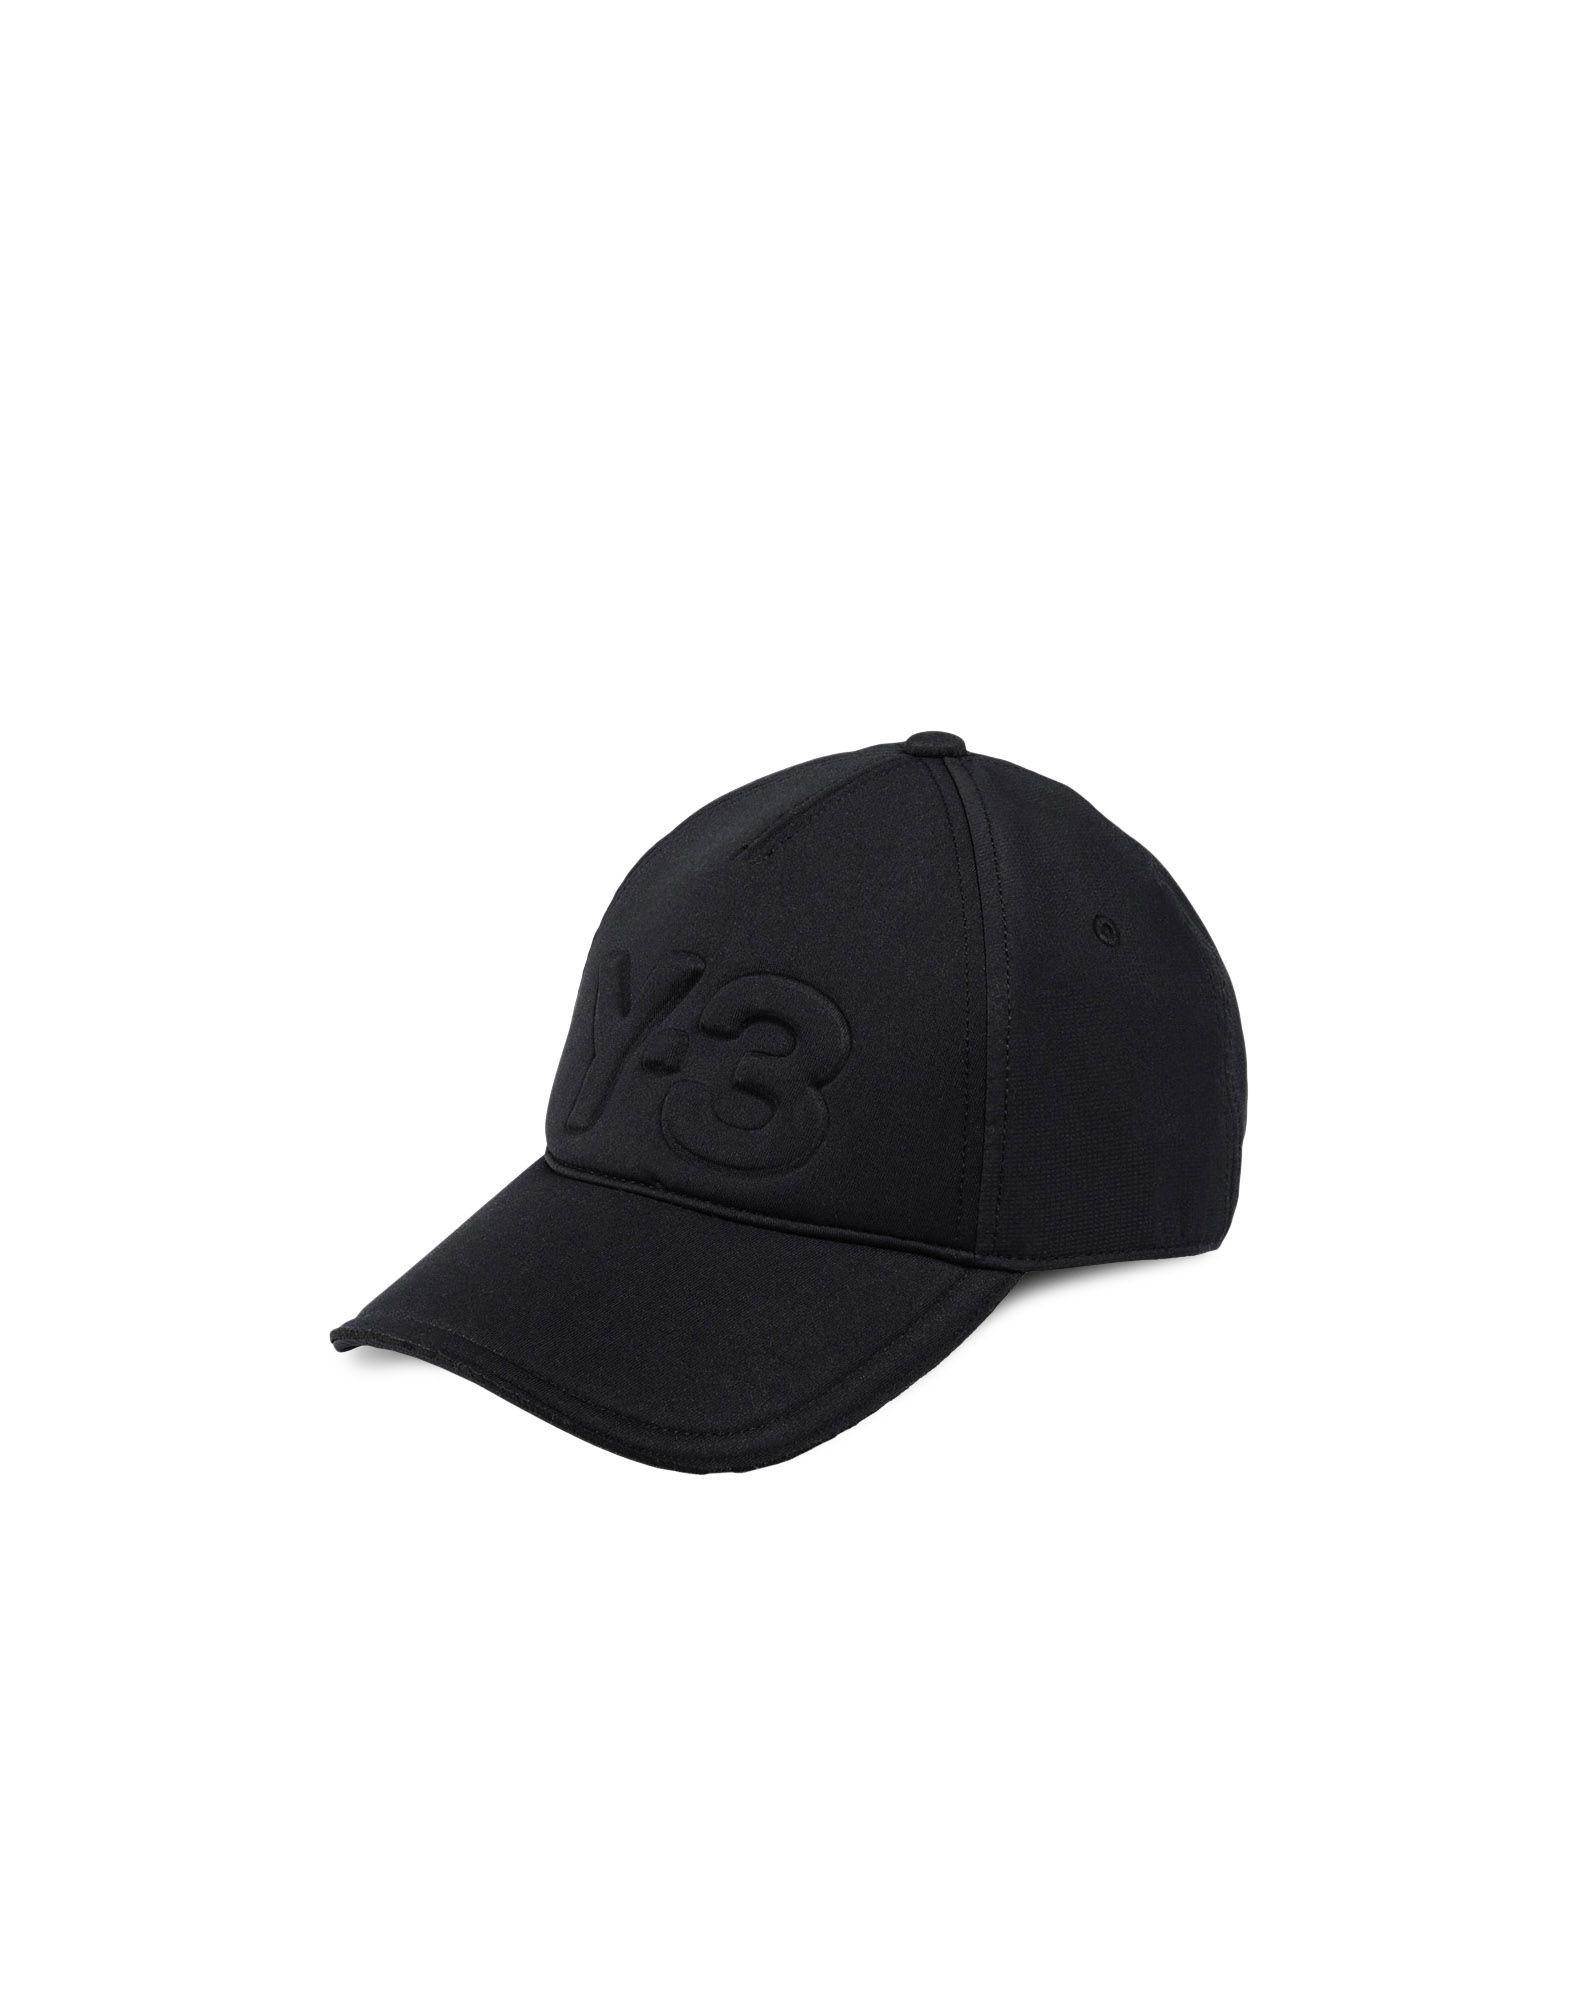 51bc15c2078 Y-3 DEBOSSED CAP